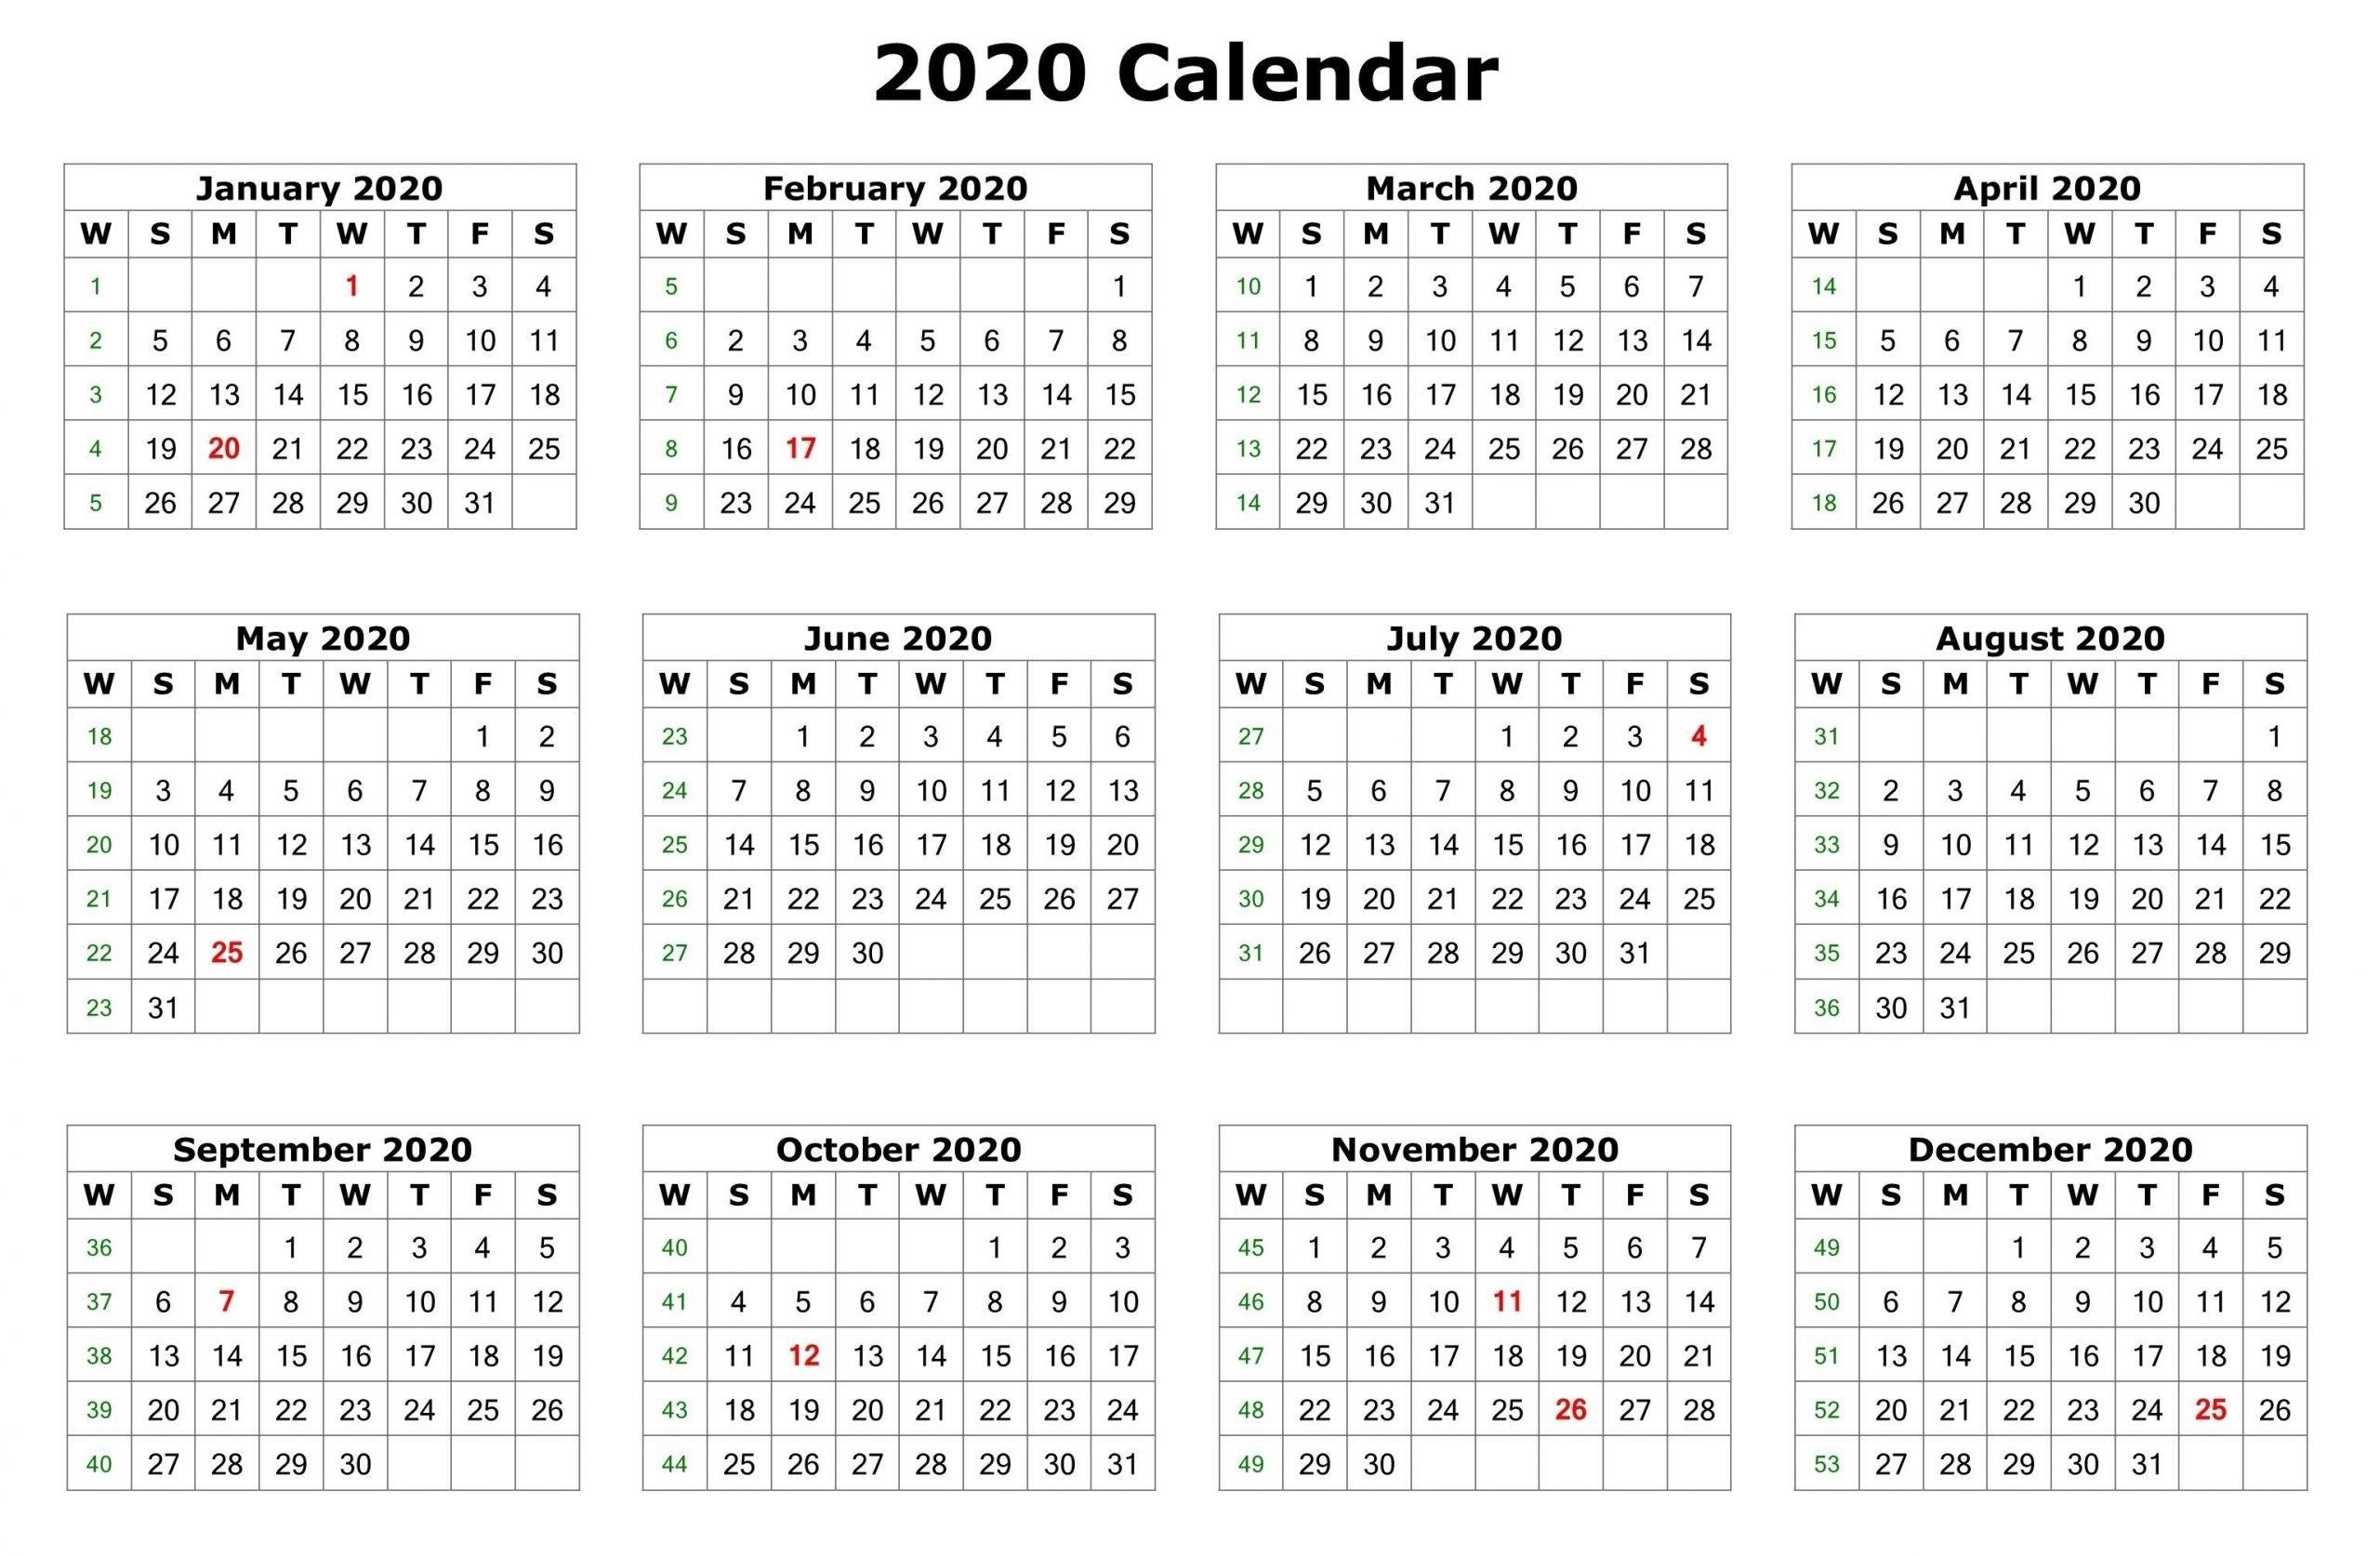 Get 8X11 Printable 2020 Calendar | Calendar Printables Free Blank throughout Broadcast Calendar 2019 2021